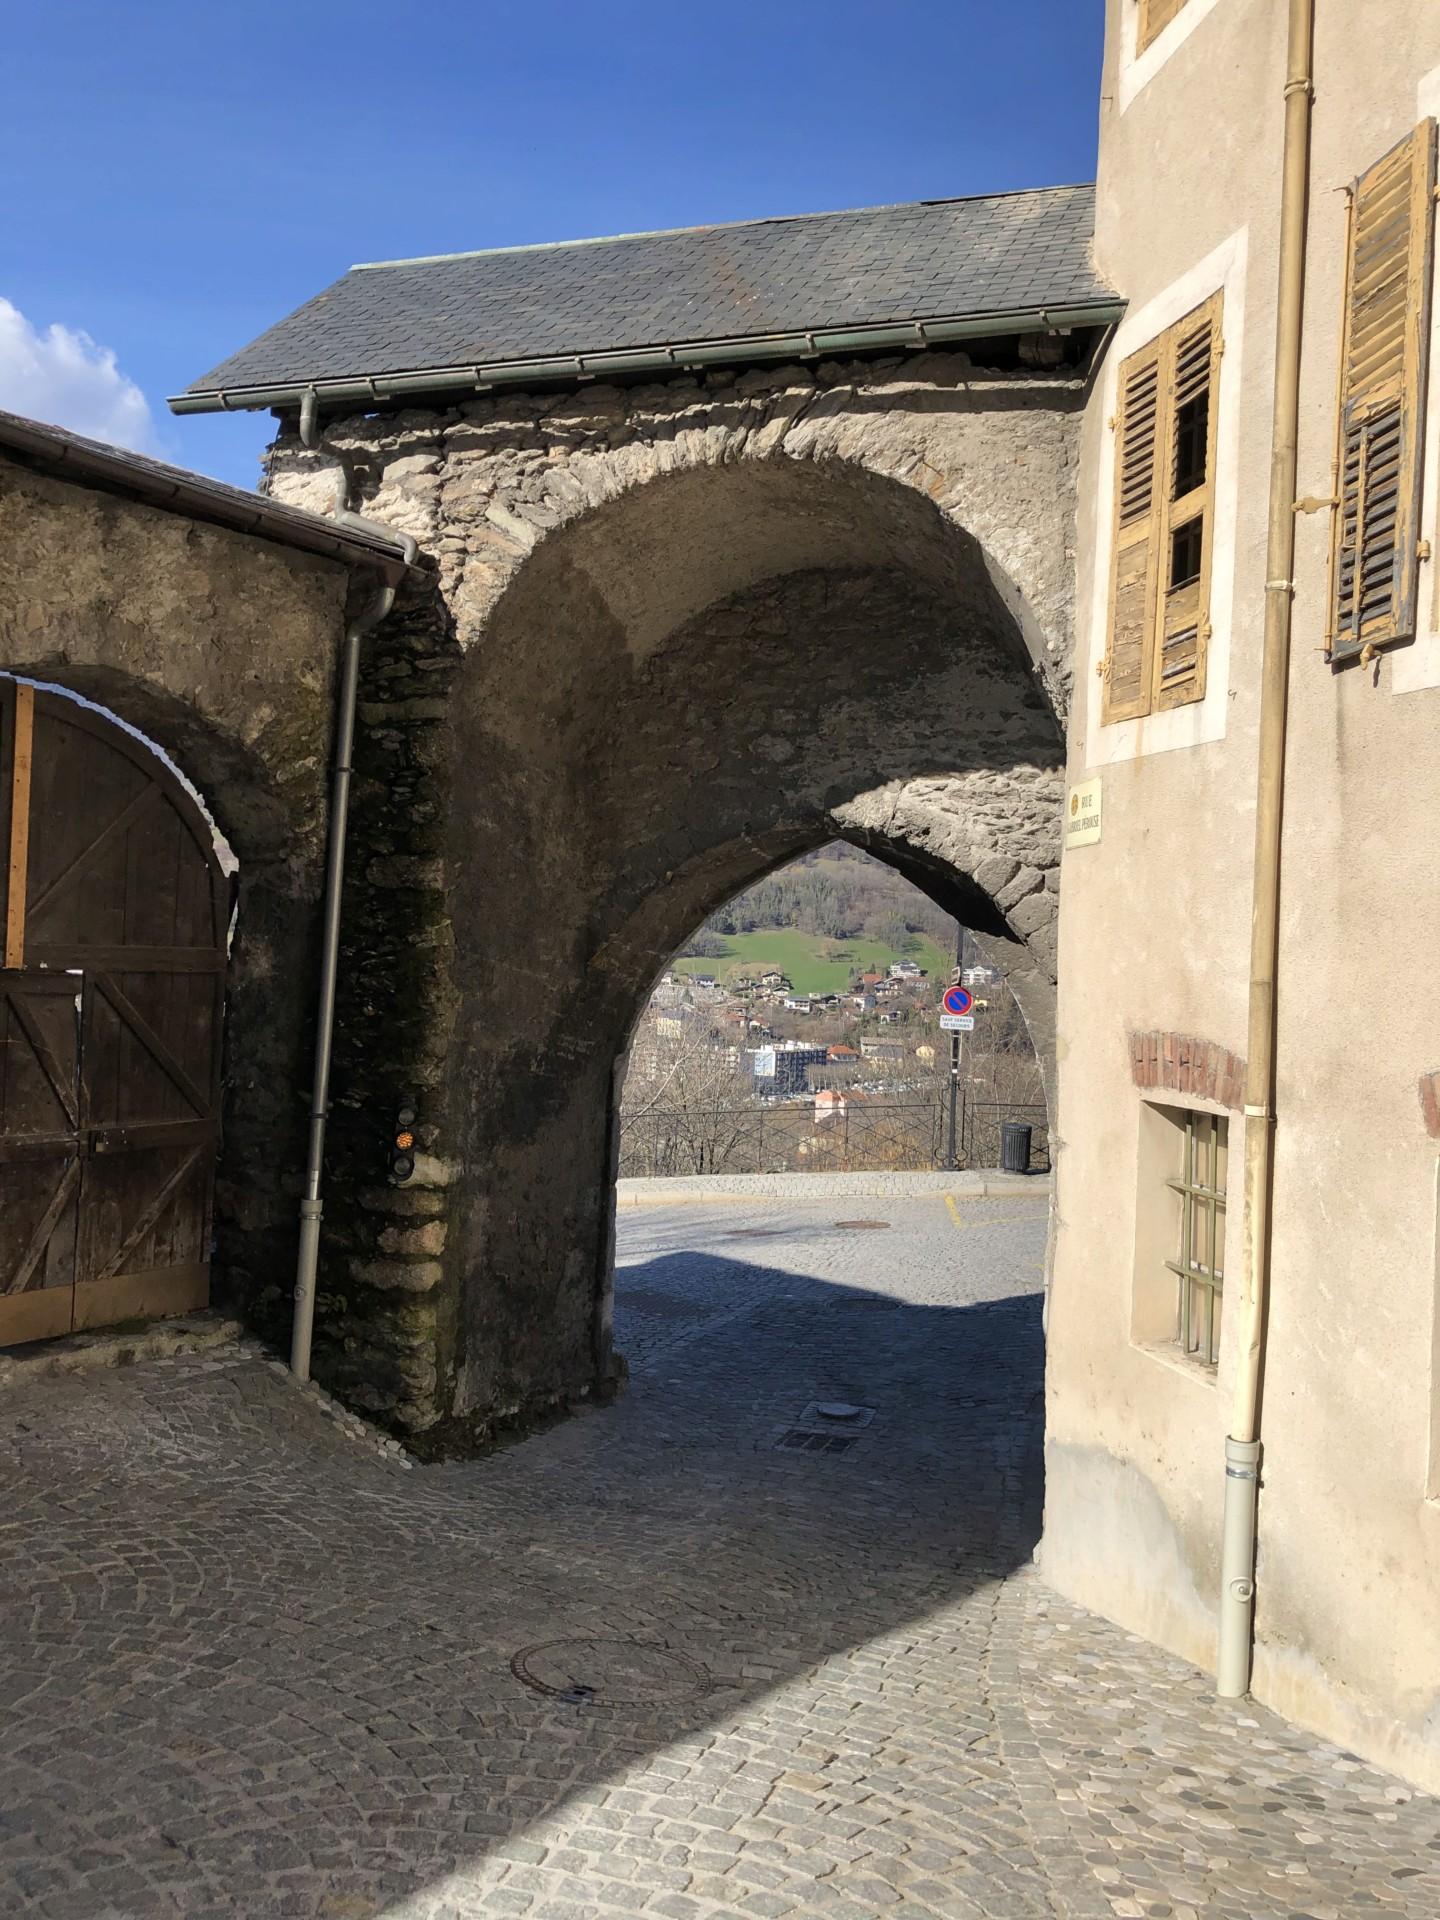 Petites balades en Rhône-Alpes - Page 2 Confla14